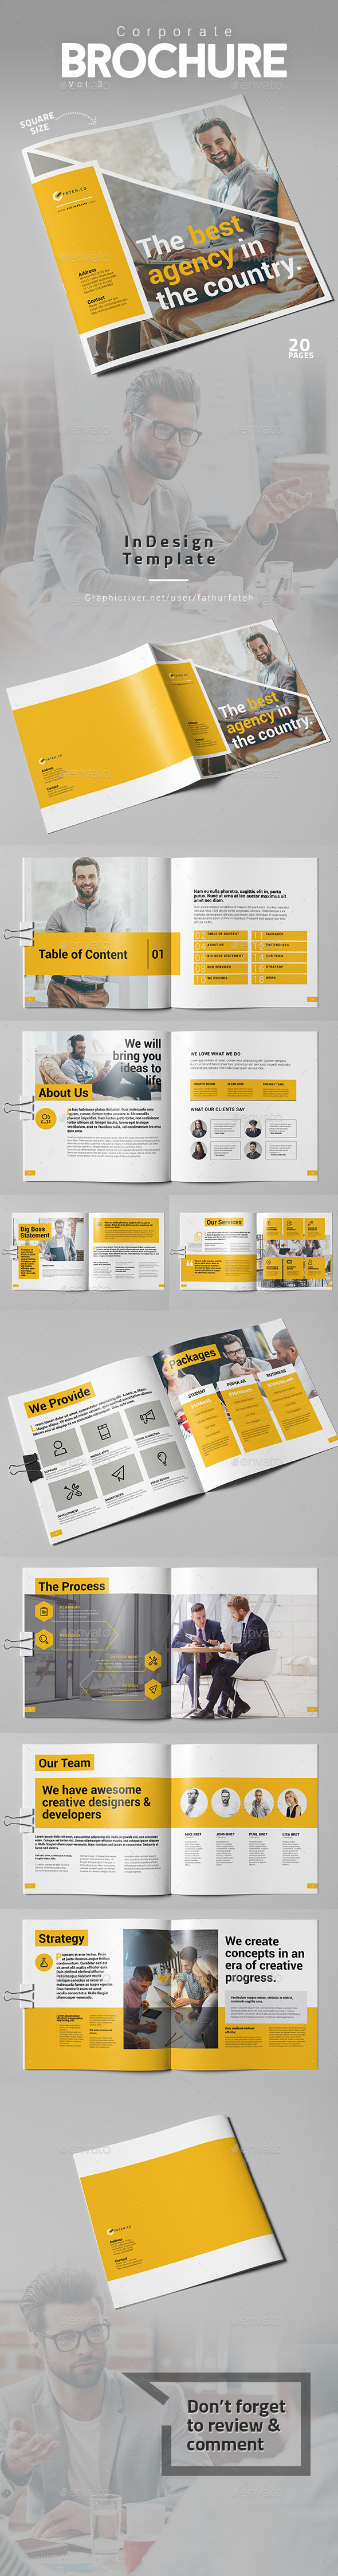 Corporate Brochure Vol.3 - Square - Corporate Brochures